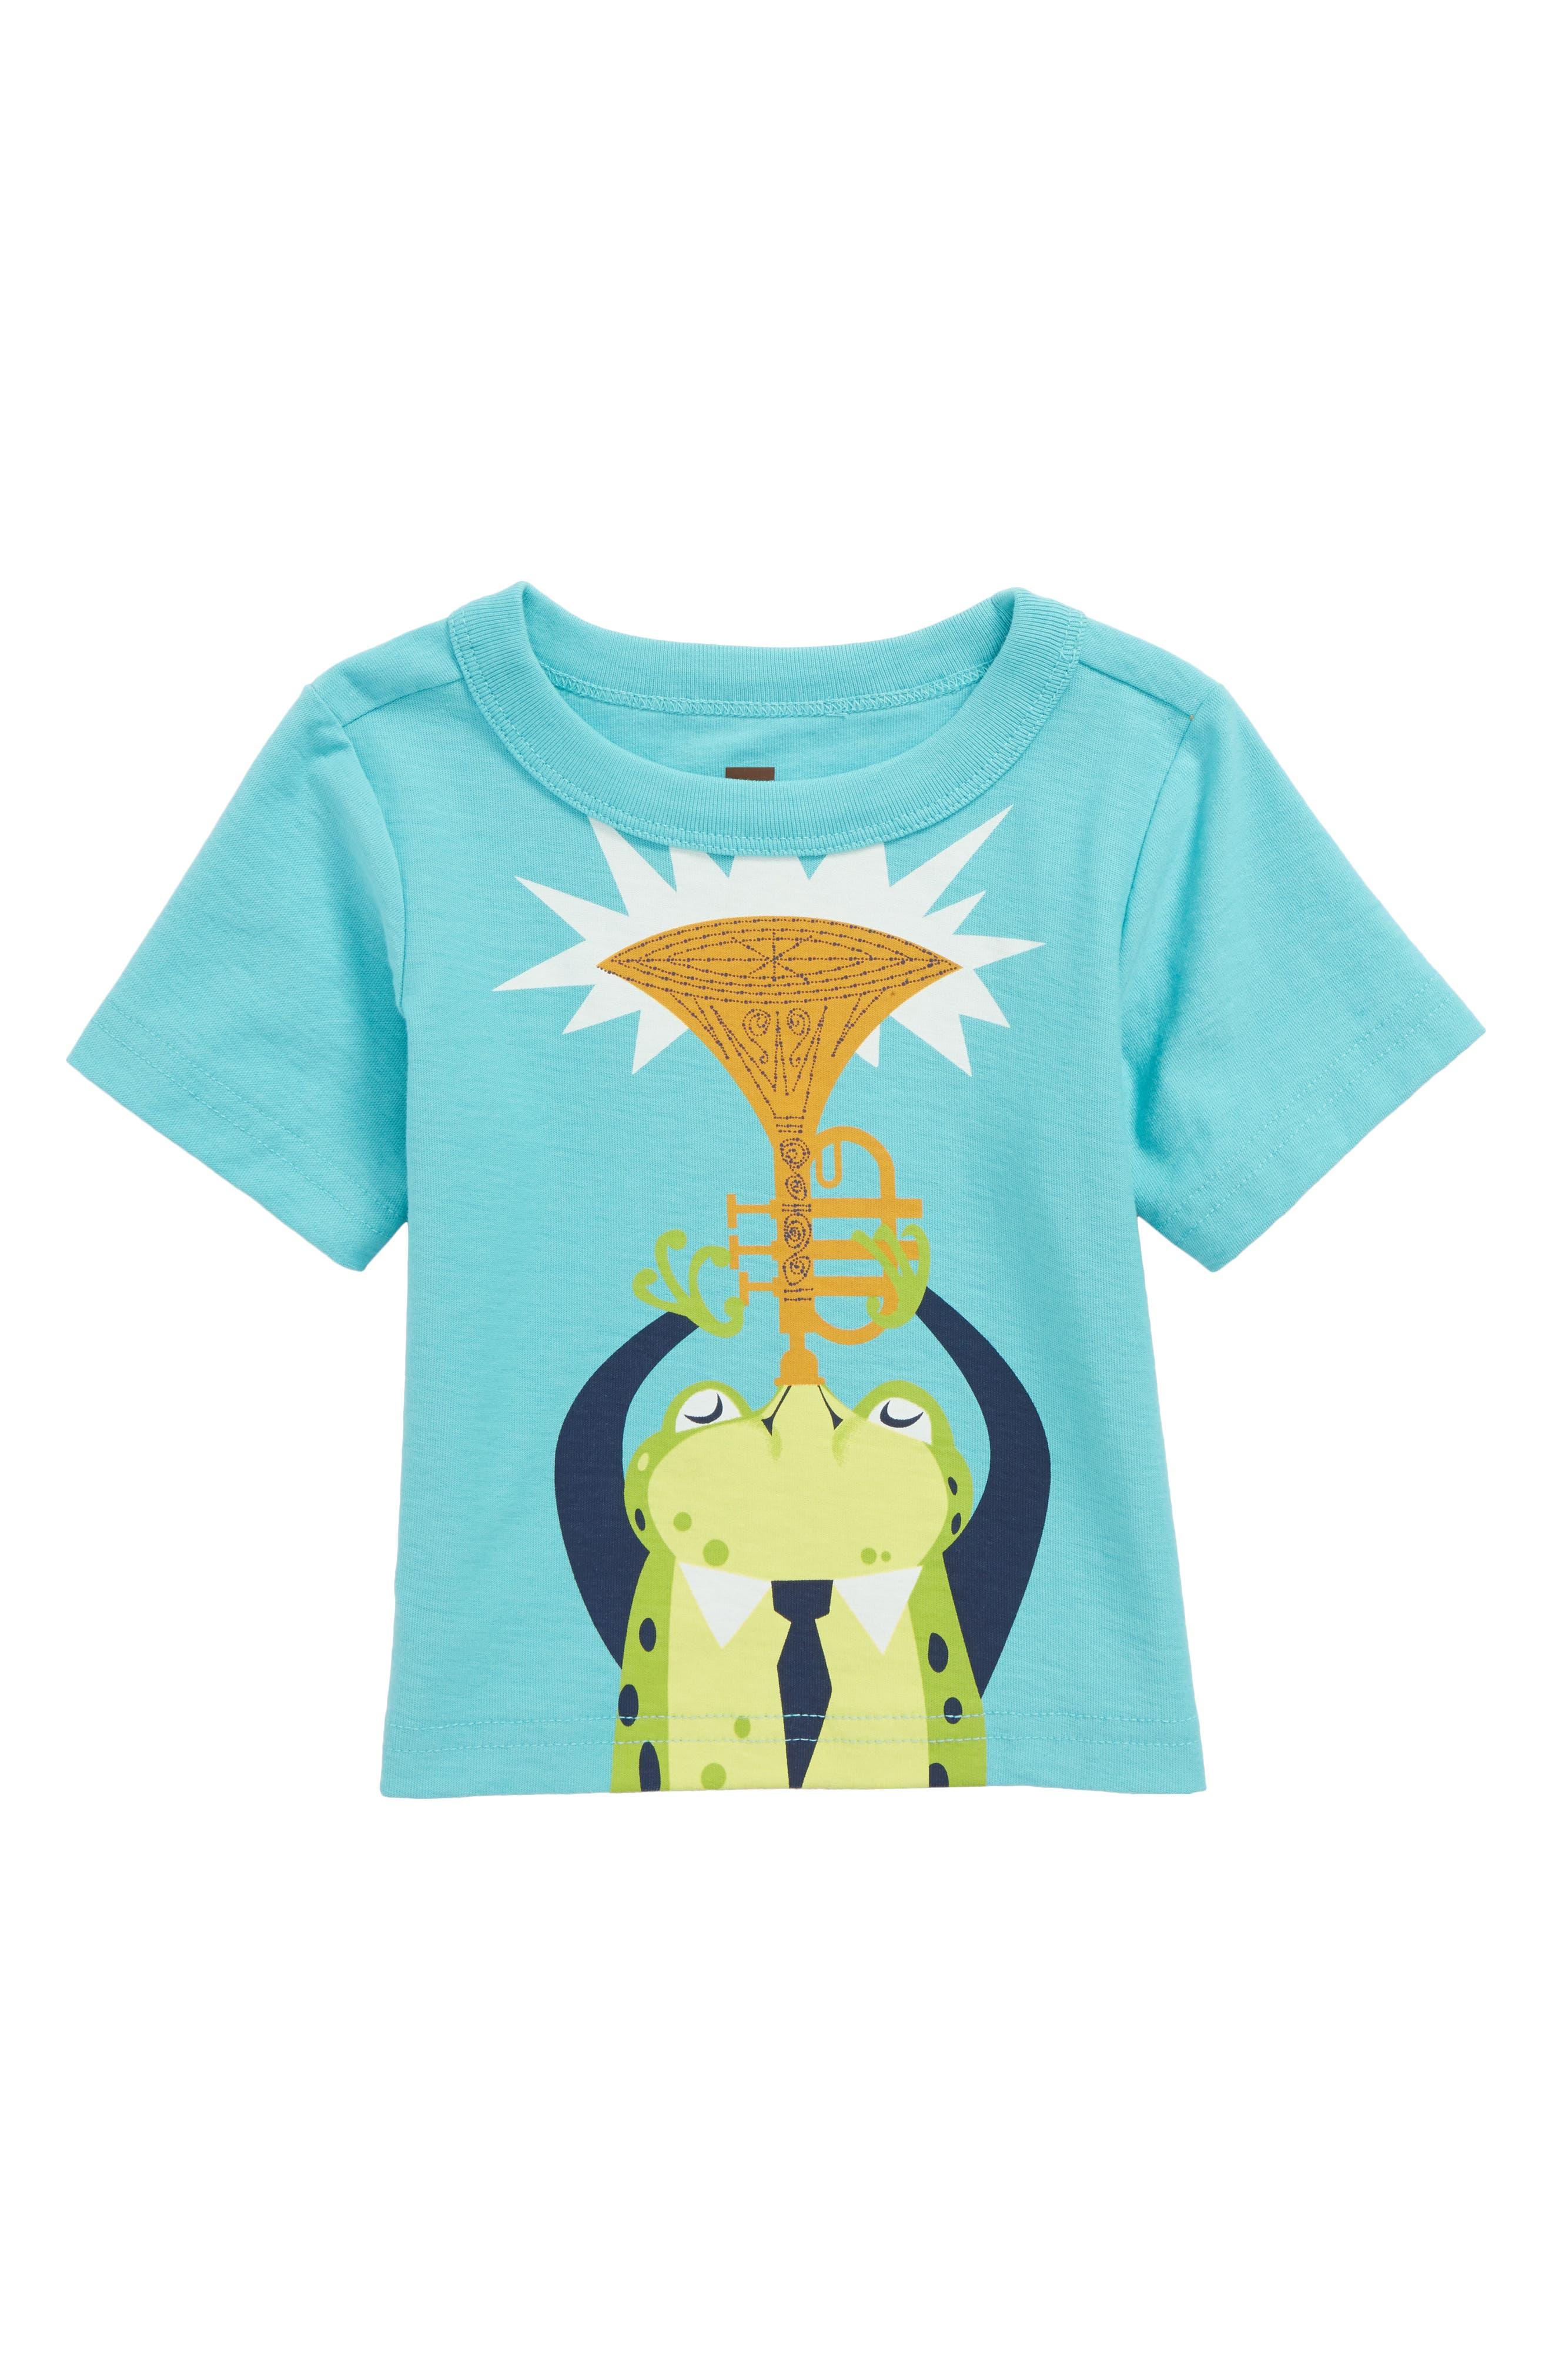 Jazz Frog T-Shirt,                         Main,                         color, Ciel